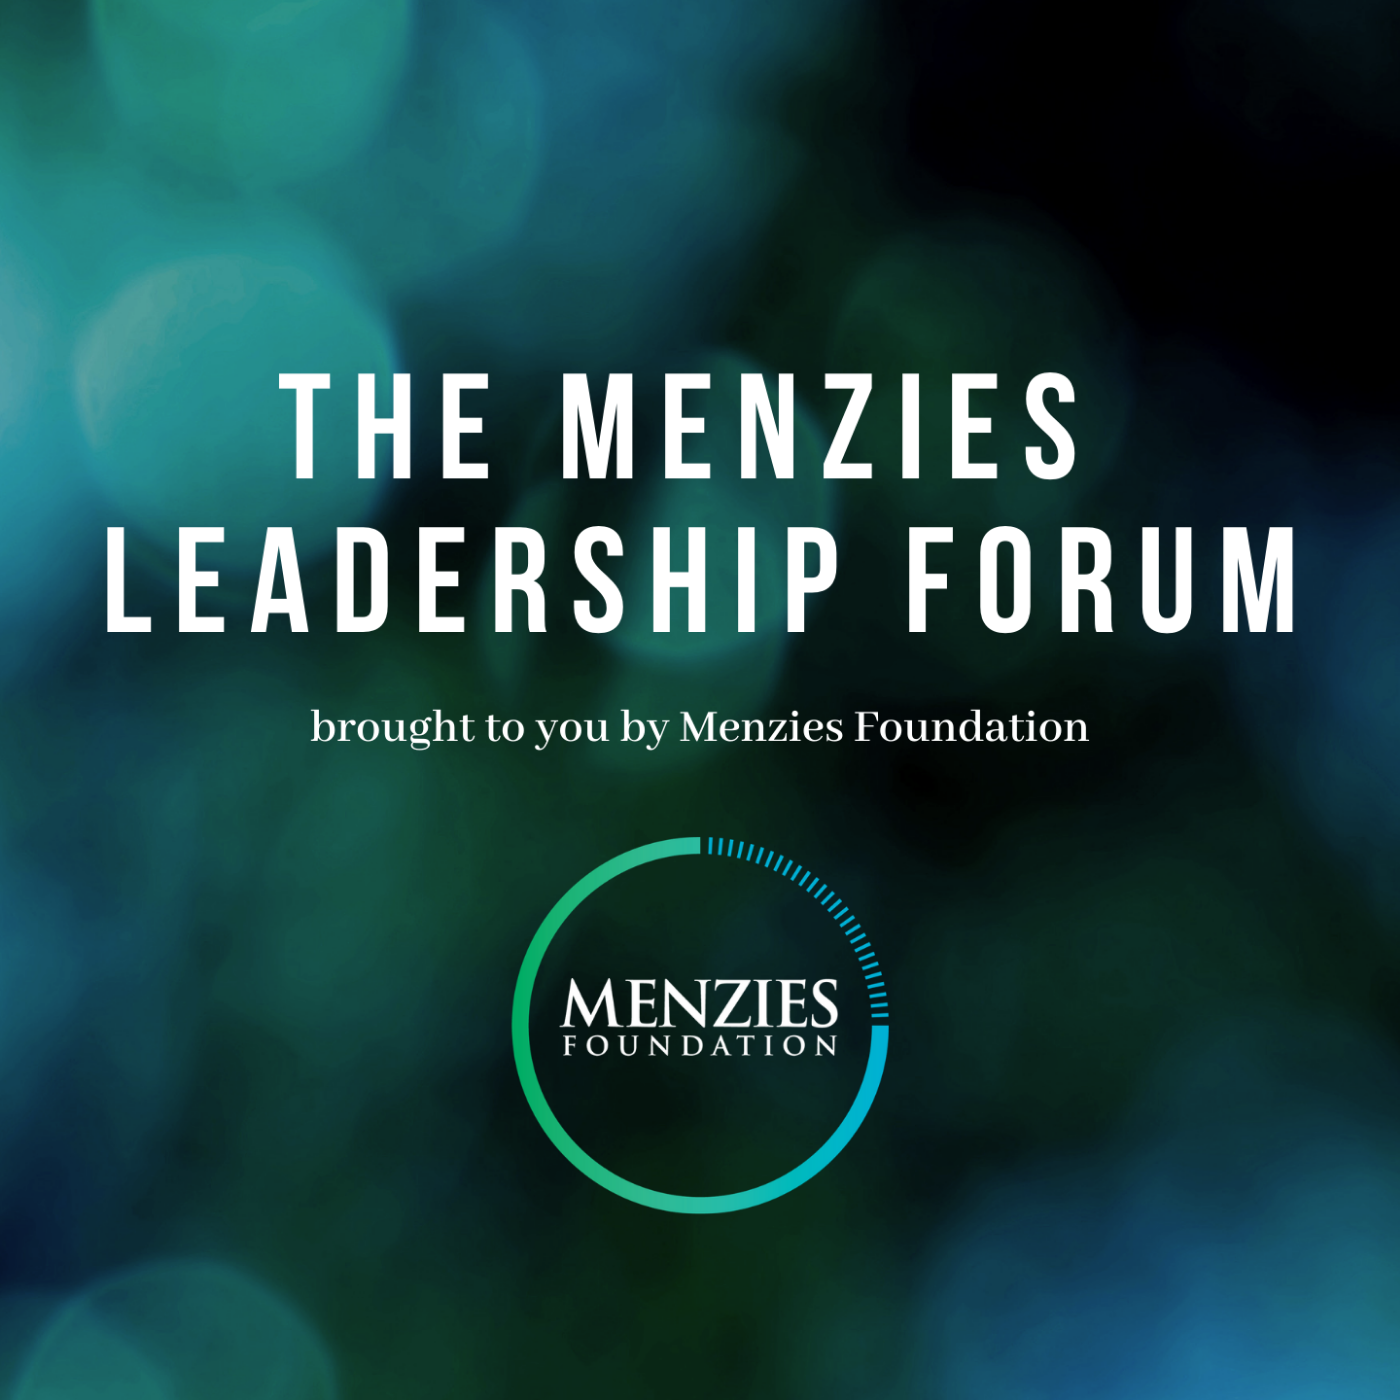 Menzies Leadership Forum